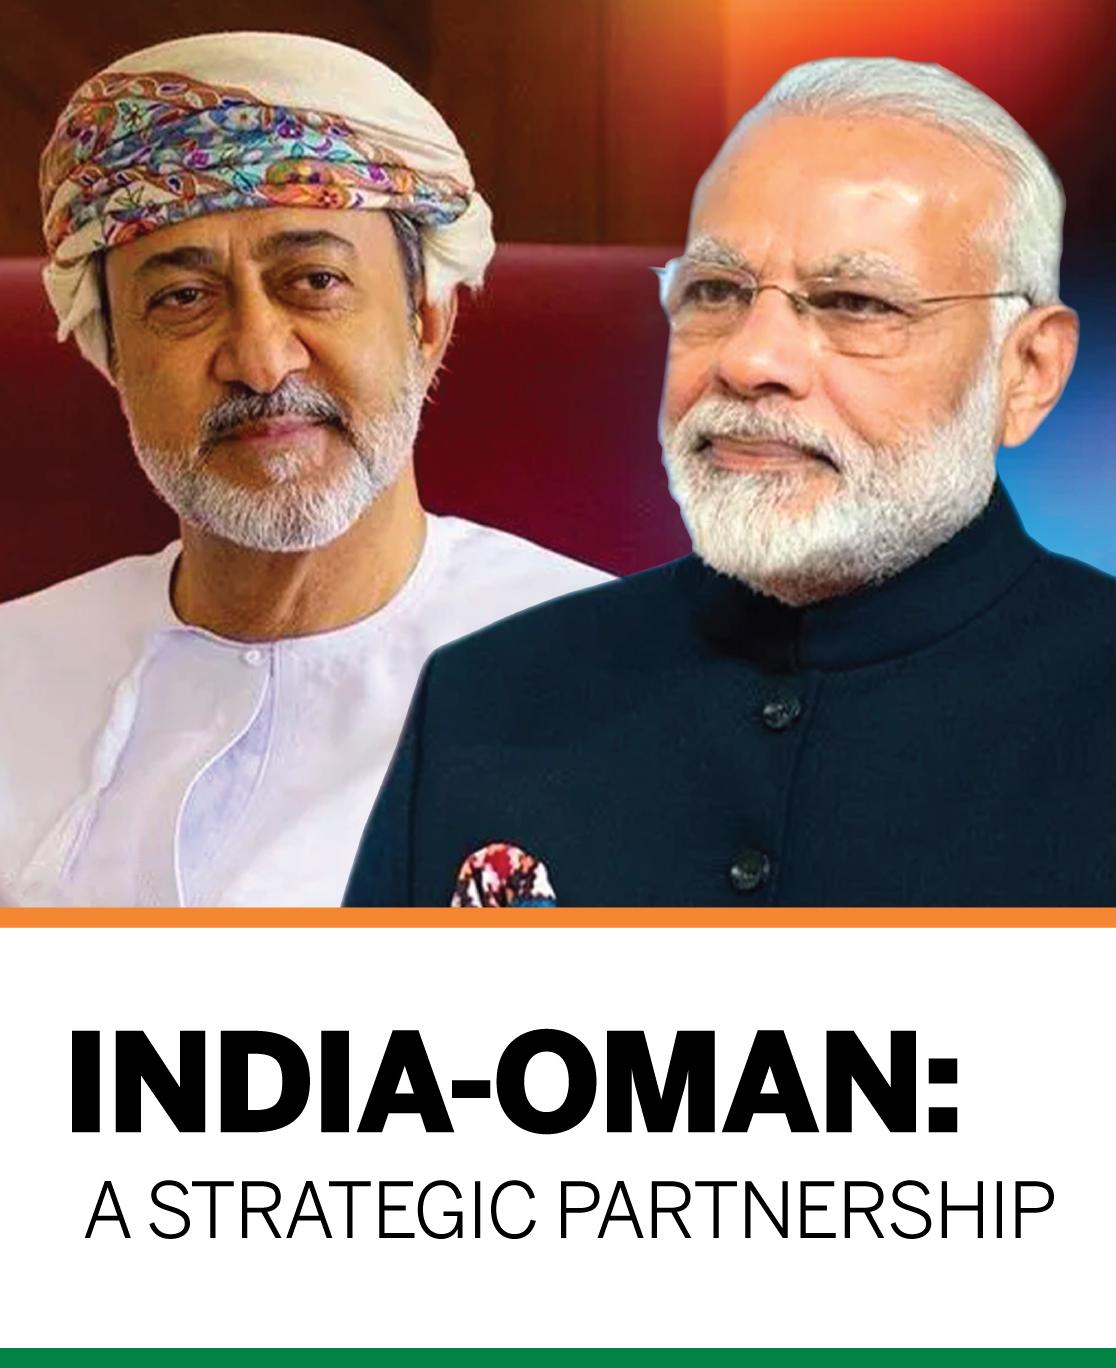 Oman India bilateral relations